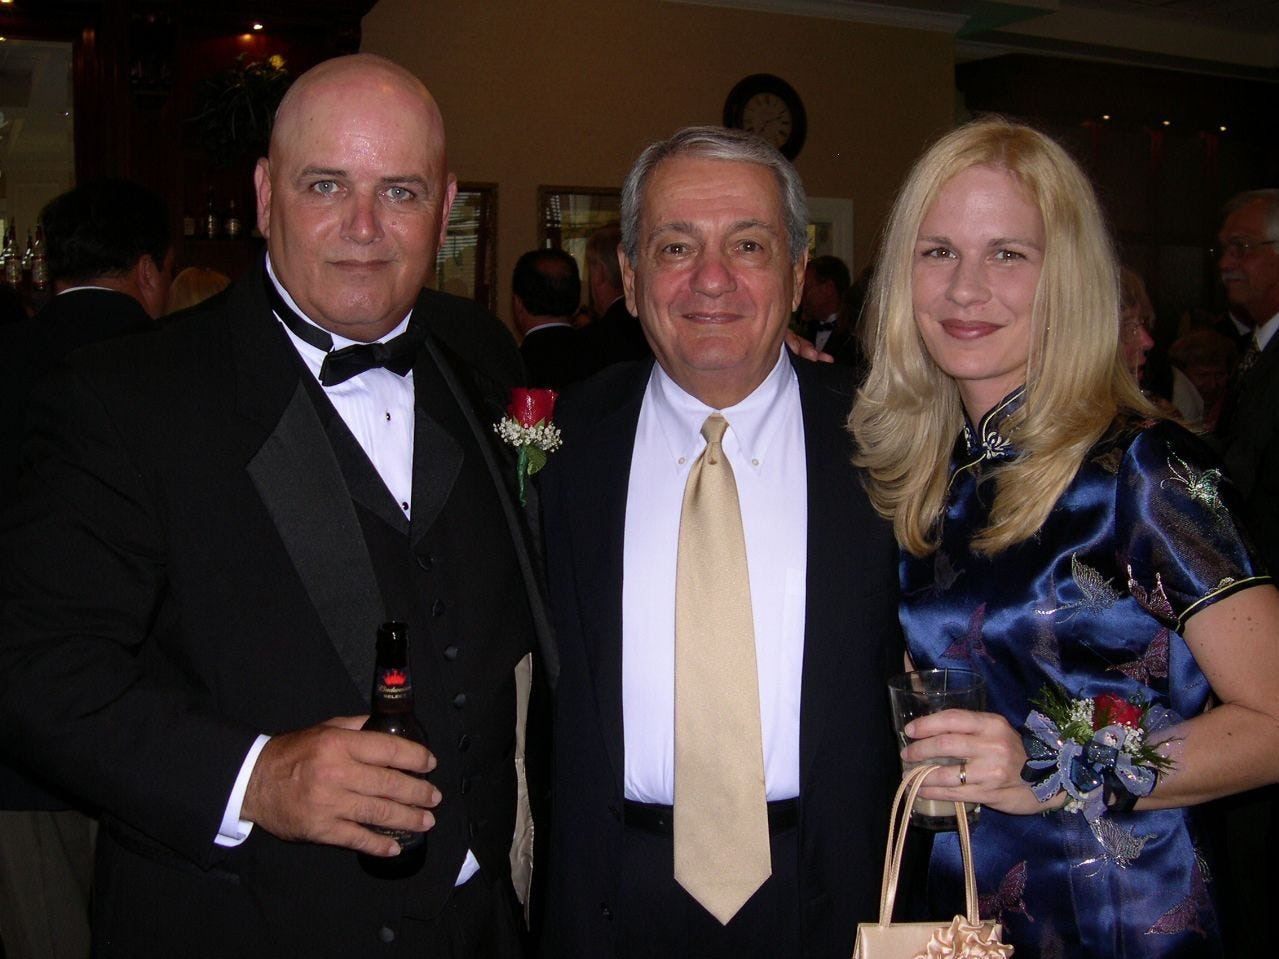 At the 2007 Palm Bay Mayor's Benefit Ball: David Isnardi/Palm Bay, left, Nick Tsamoutales/Palm Bay, and Kristine Isnardi/Palm Bay.